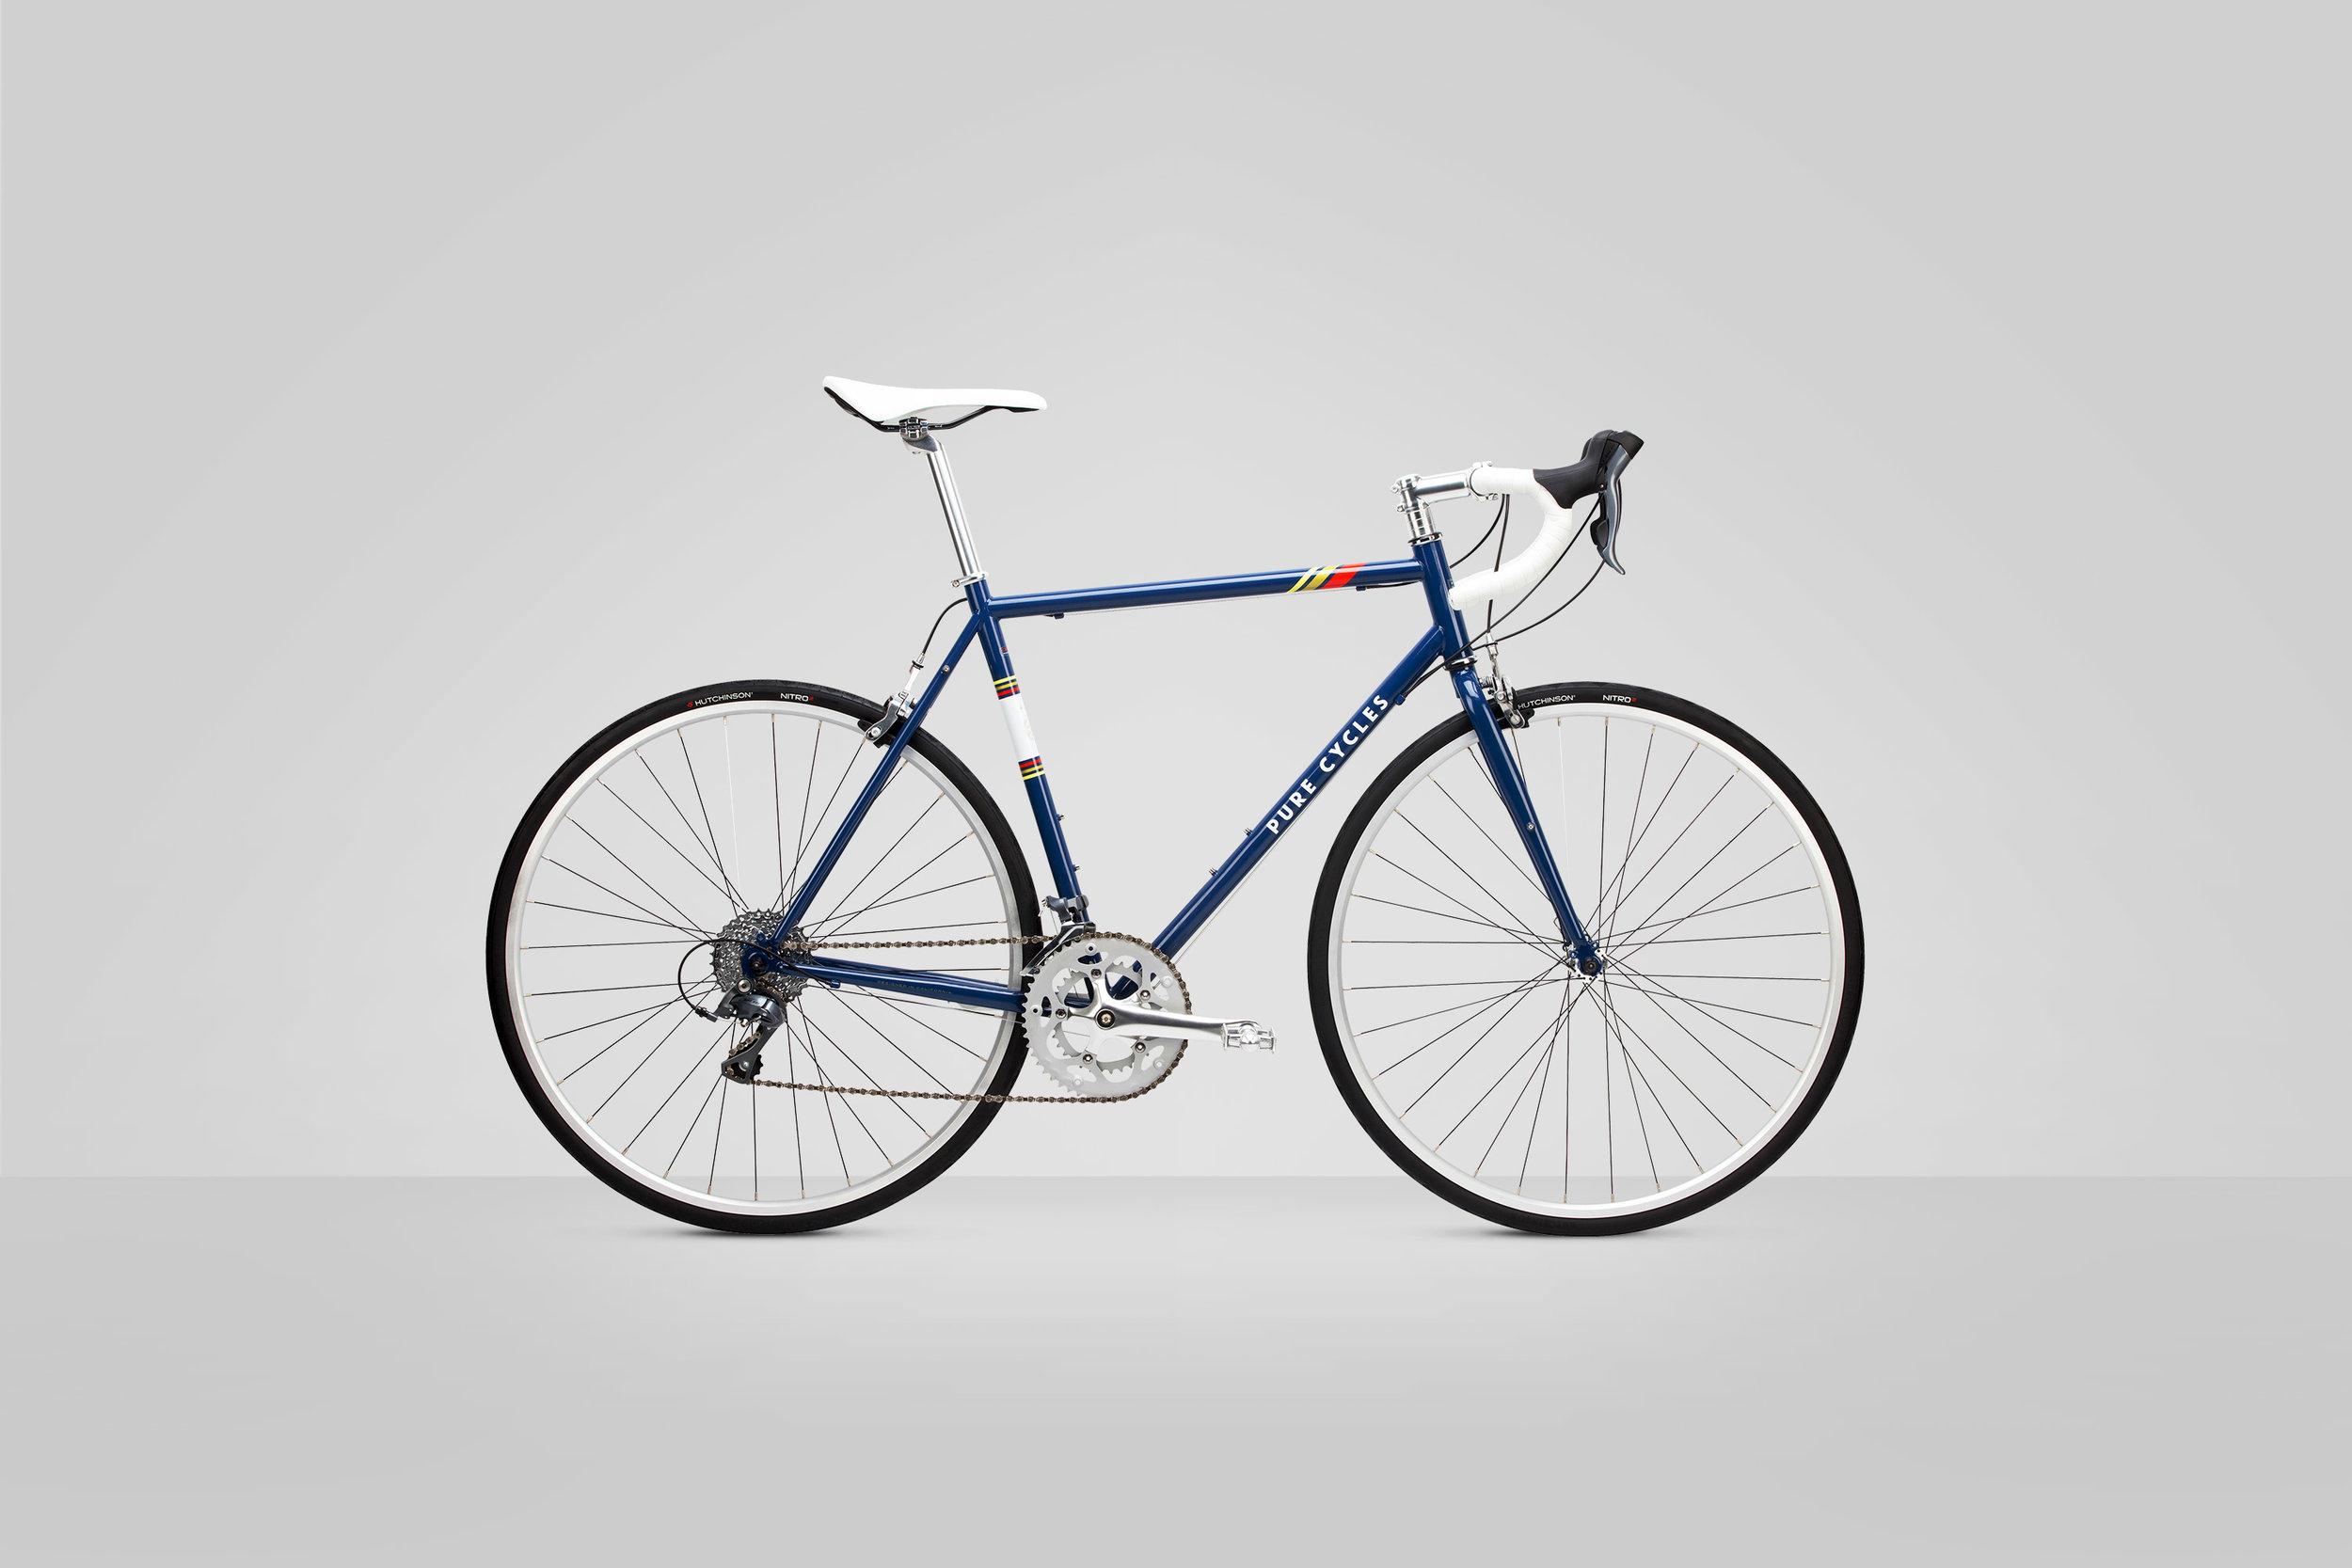 Bike_Bonnetta_GrayBack_1.jpg